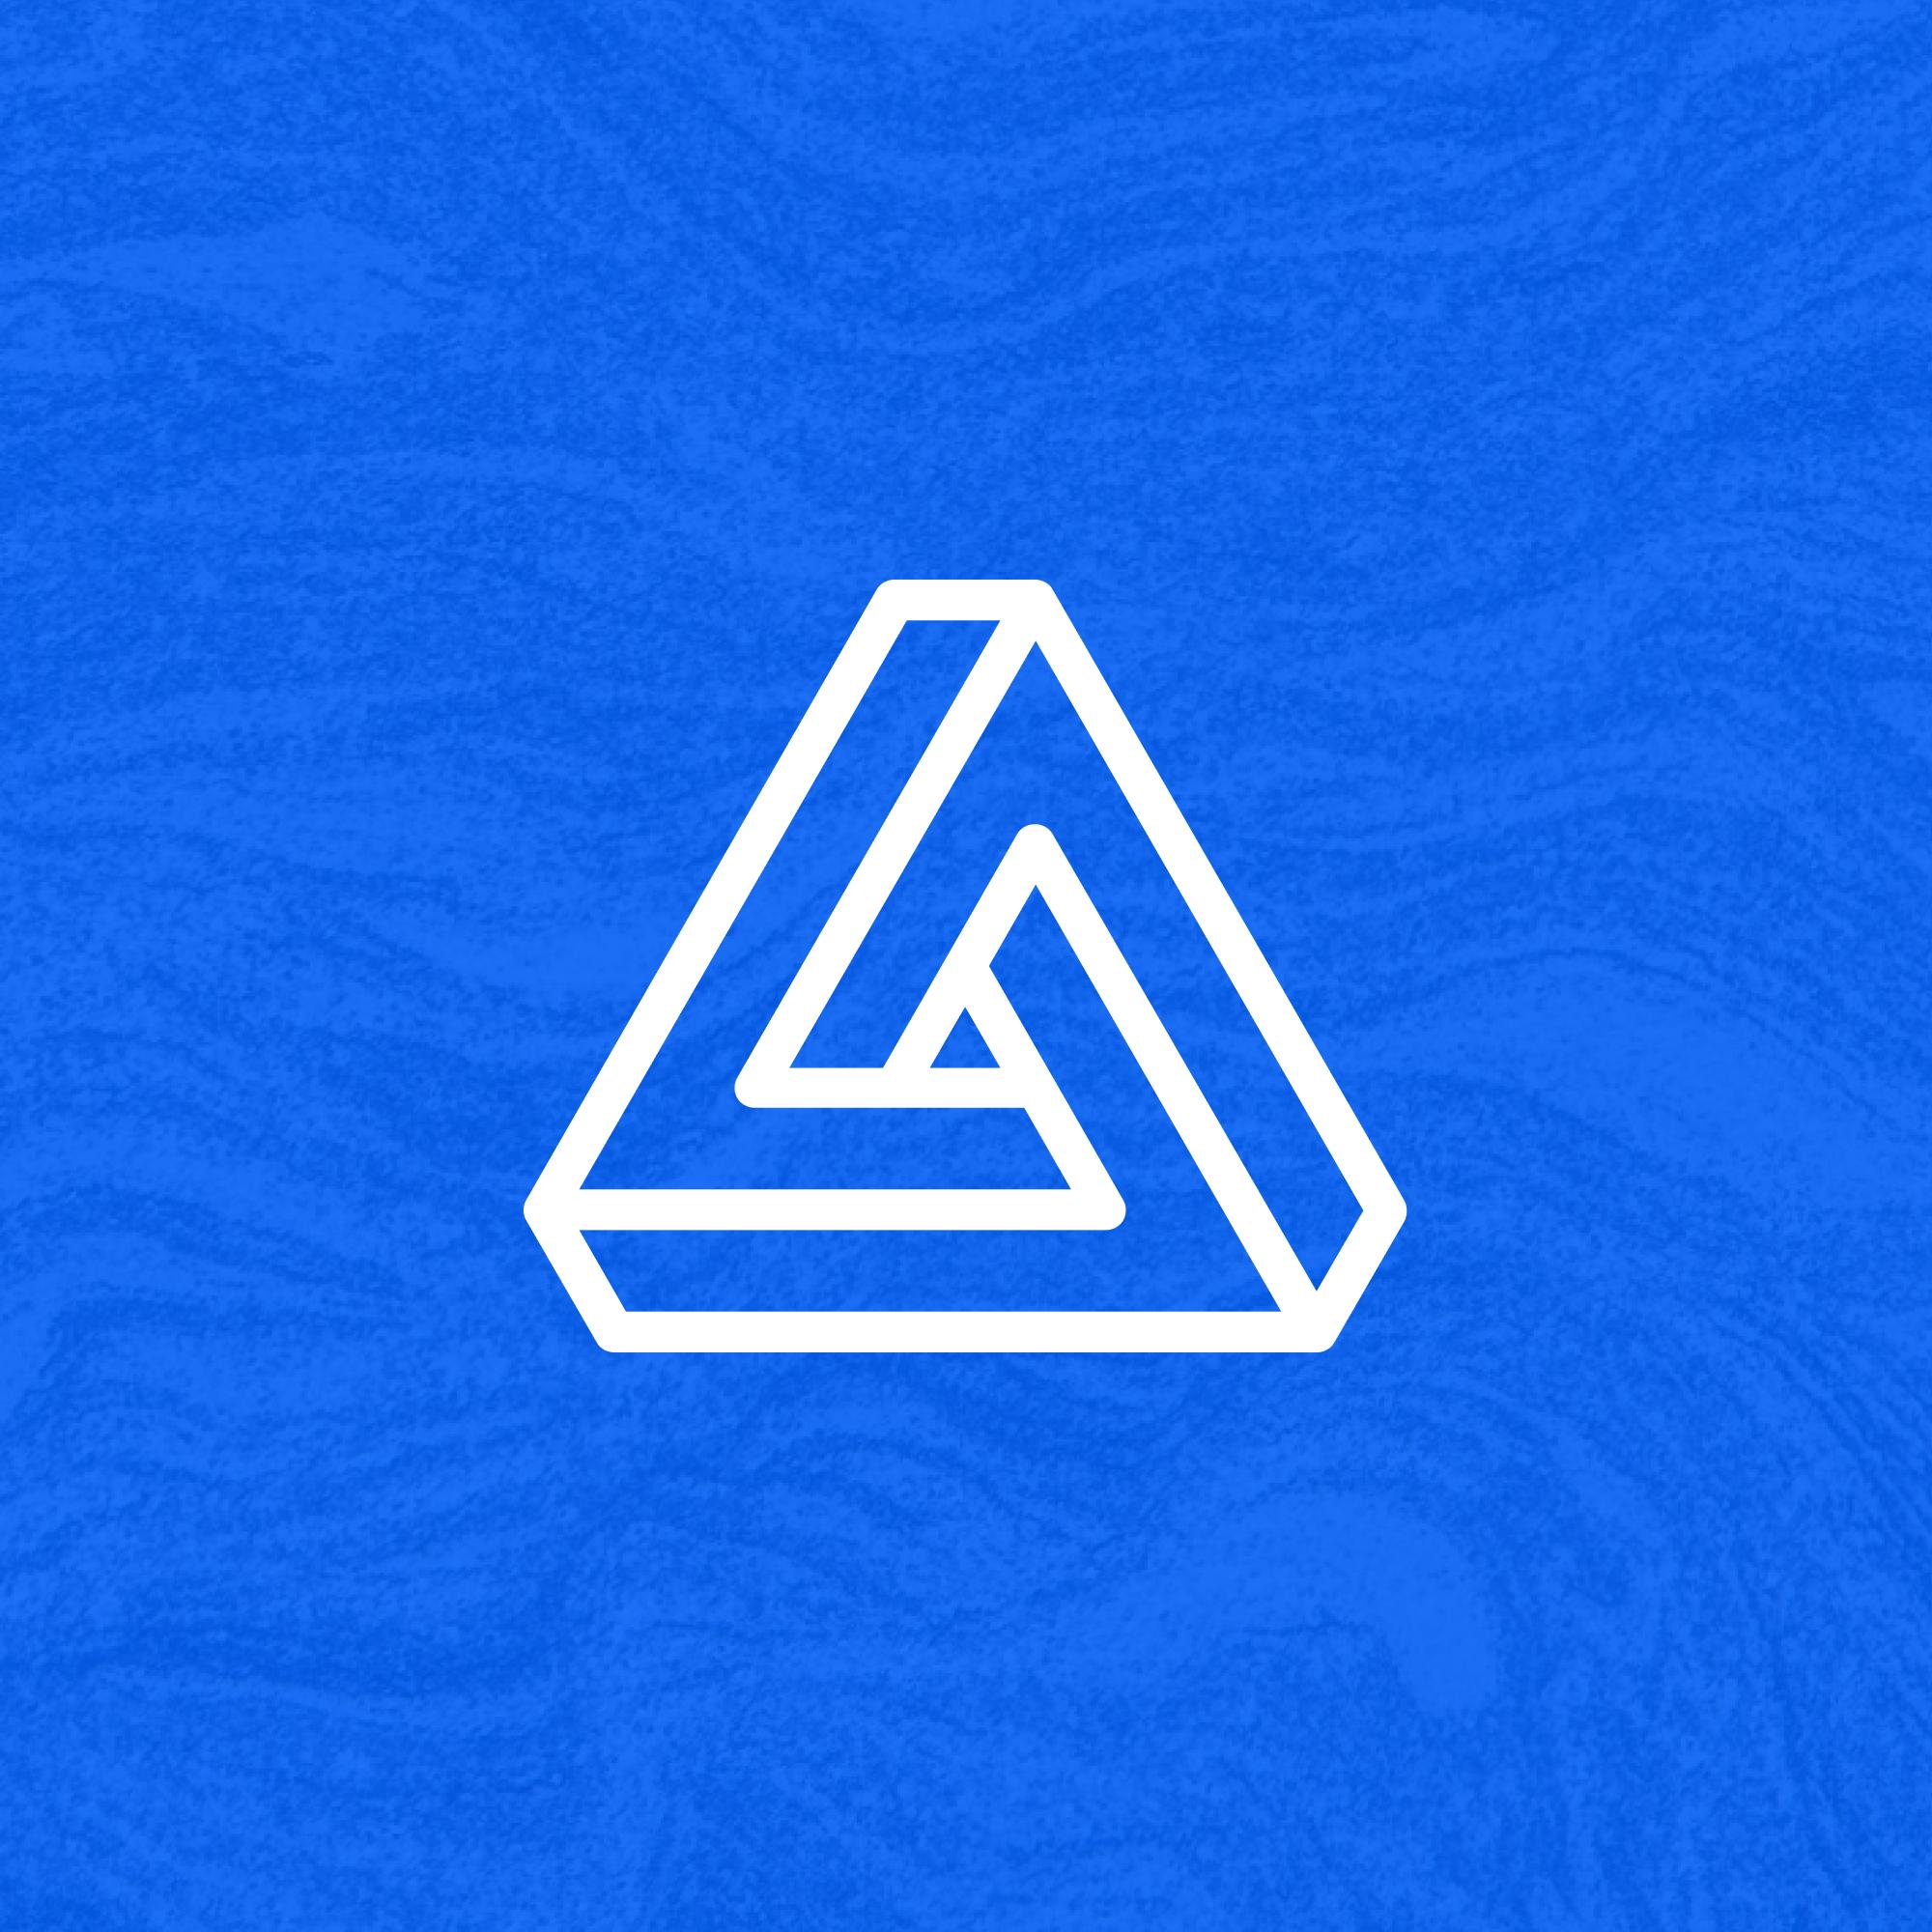 Acme Corp